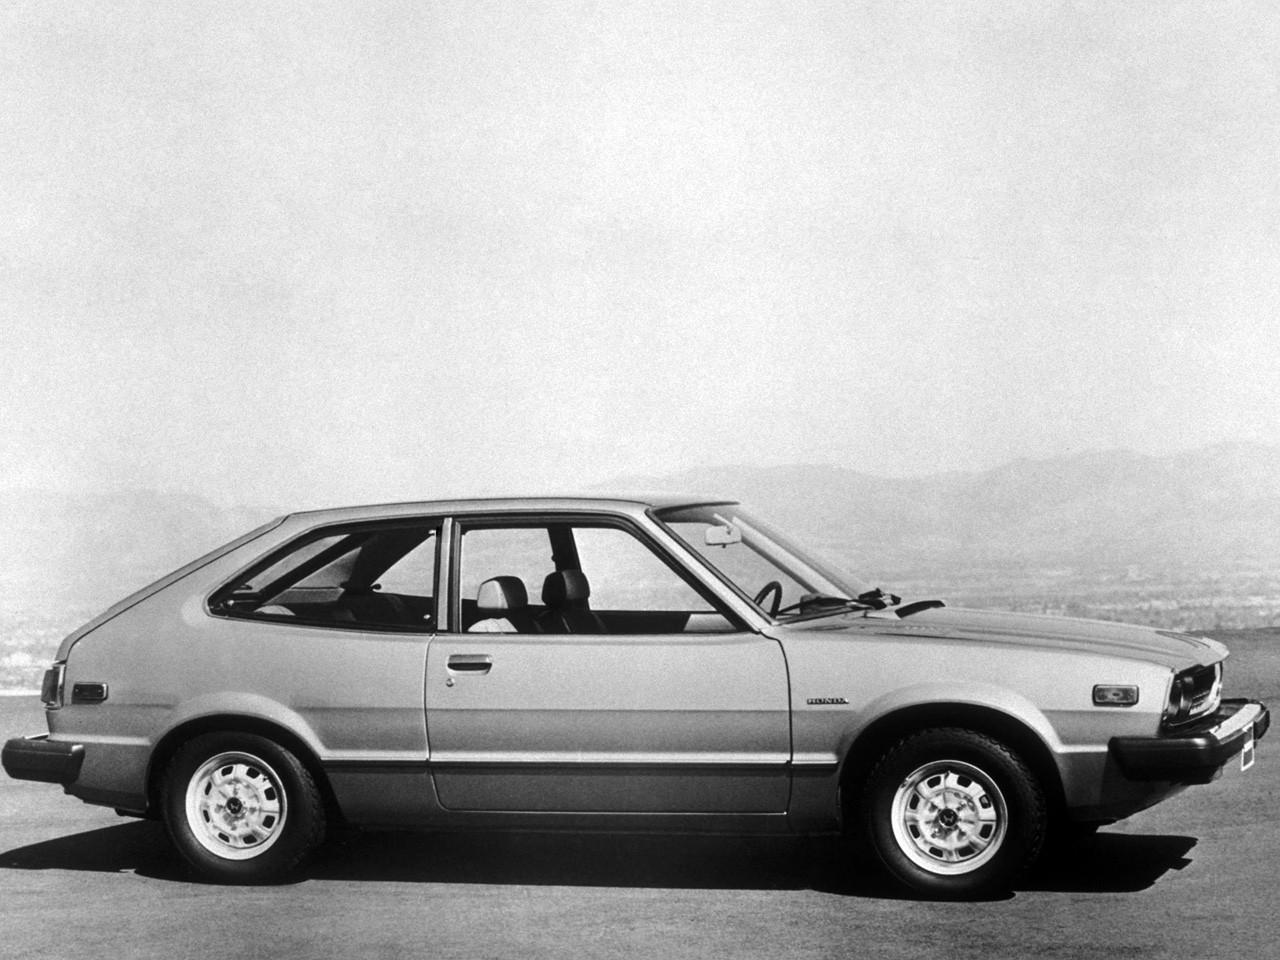 HONDA Accord 3 Doors specs & photos - 1976, 1977, 1978 ...